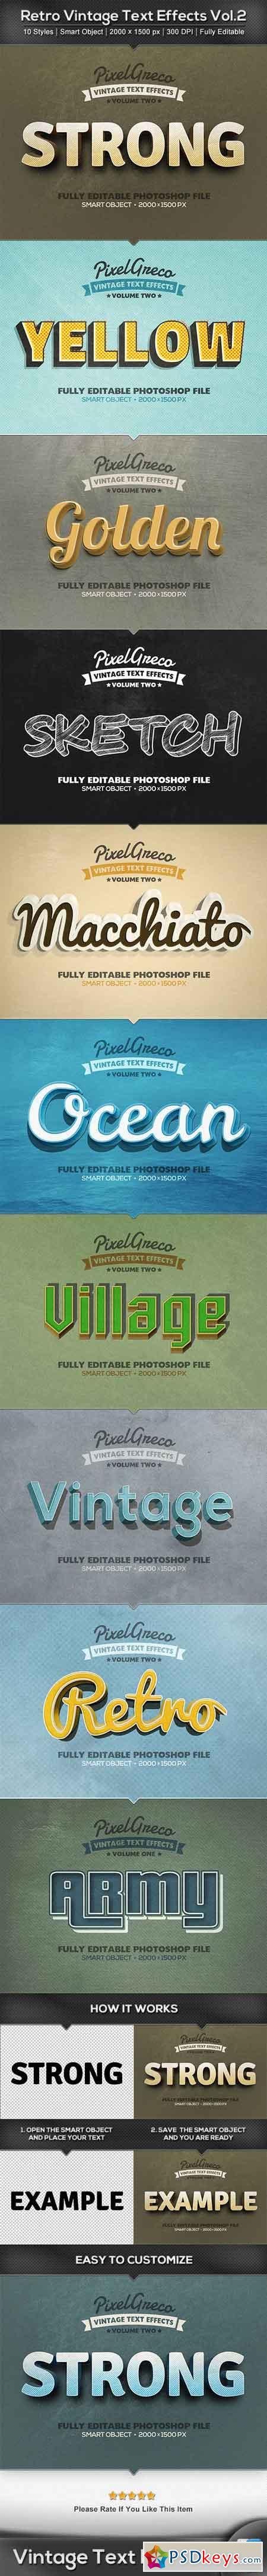 Retro Vintage Text Effects Vol2 22891278